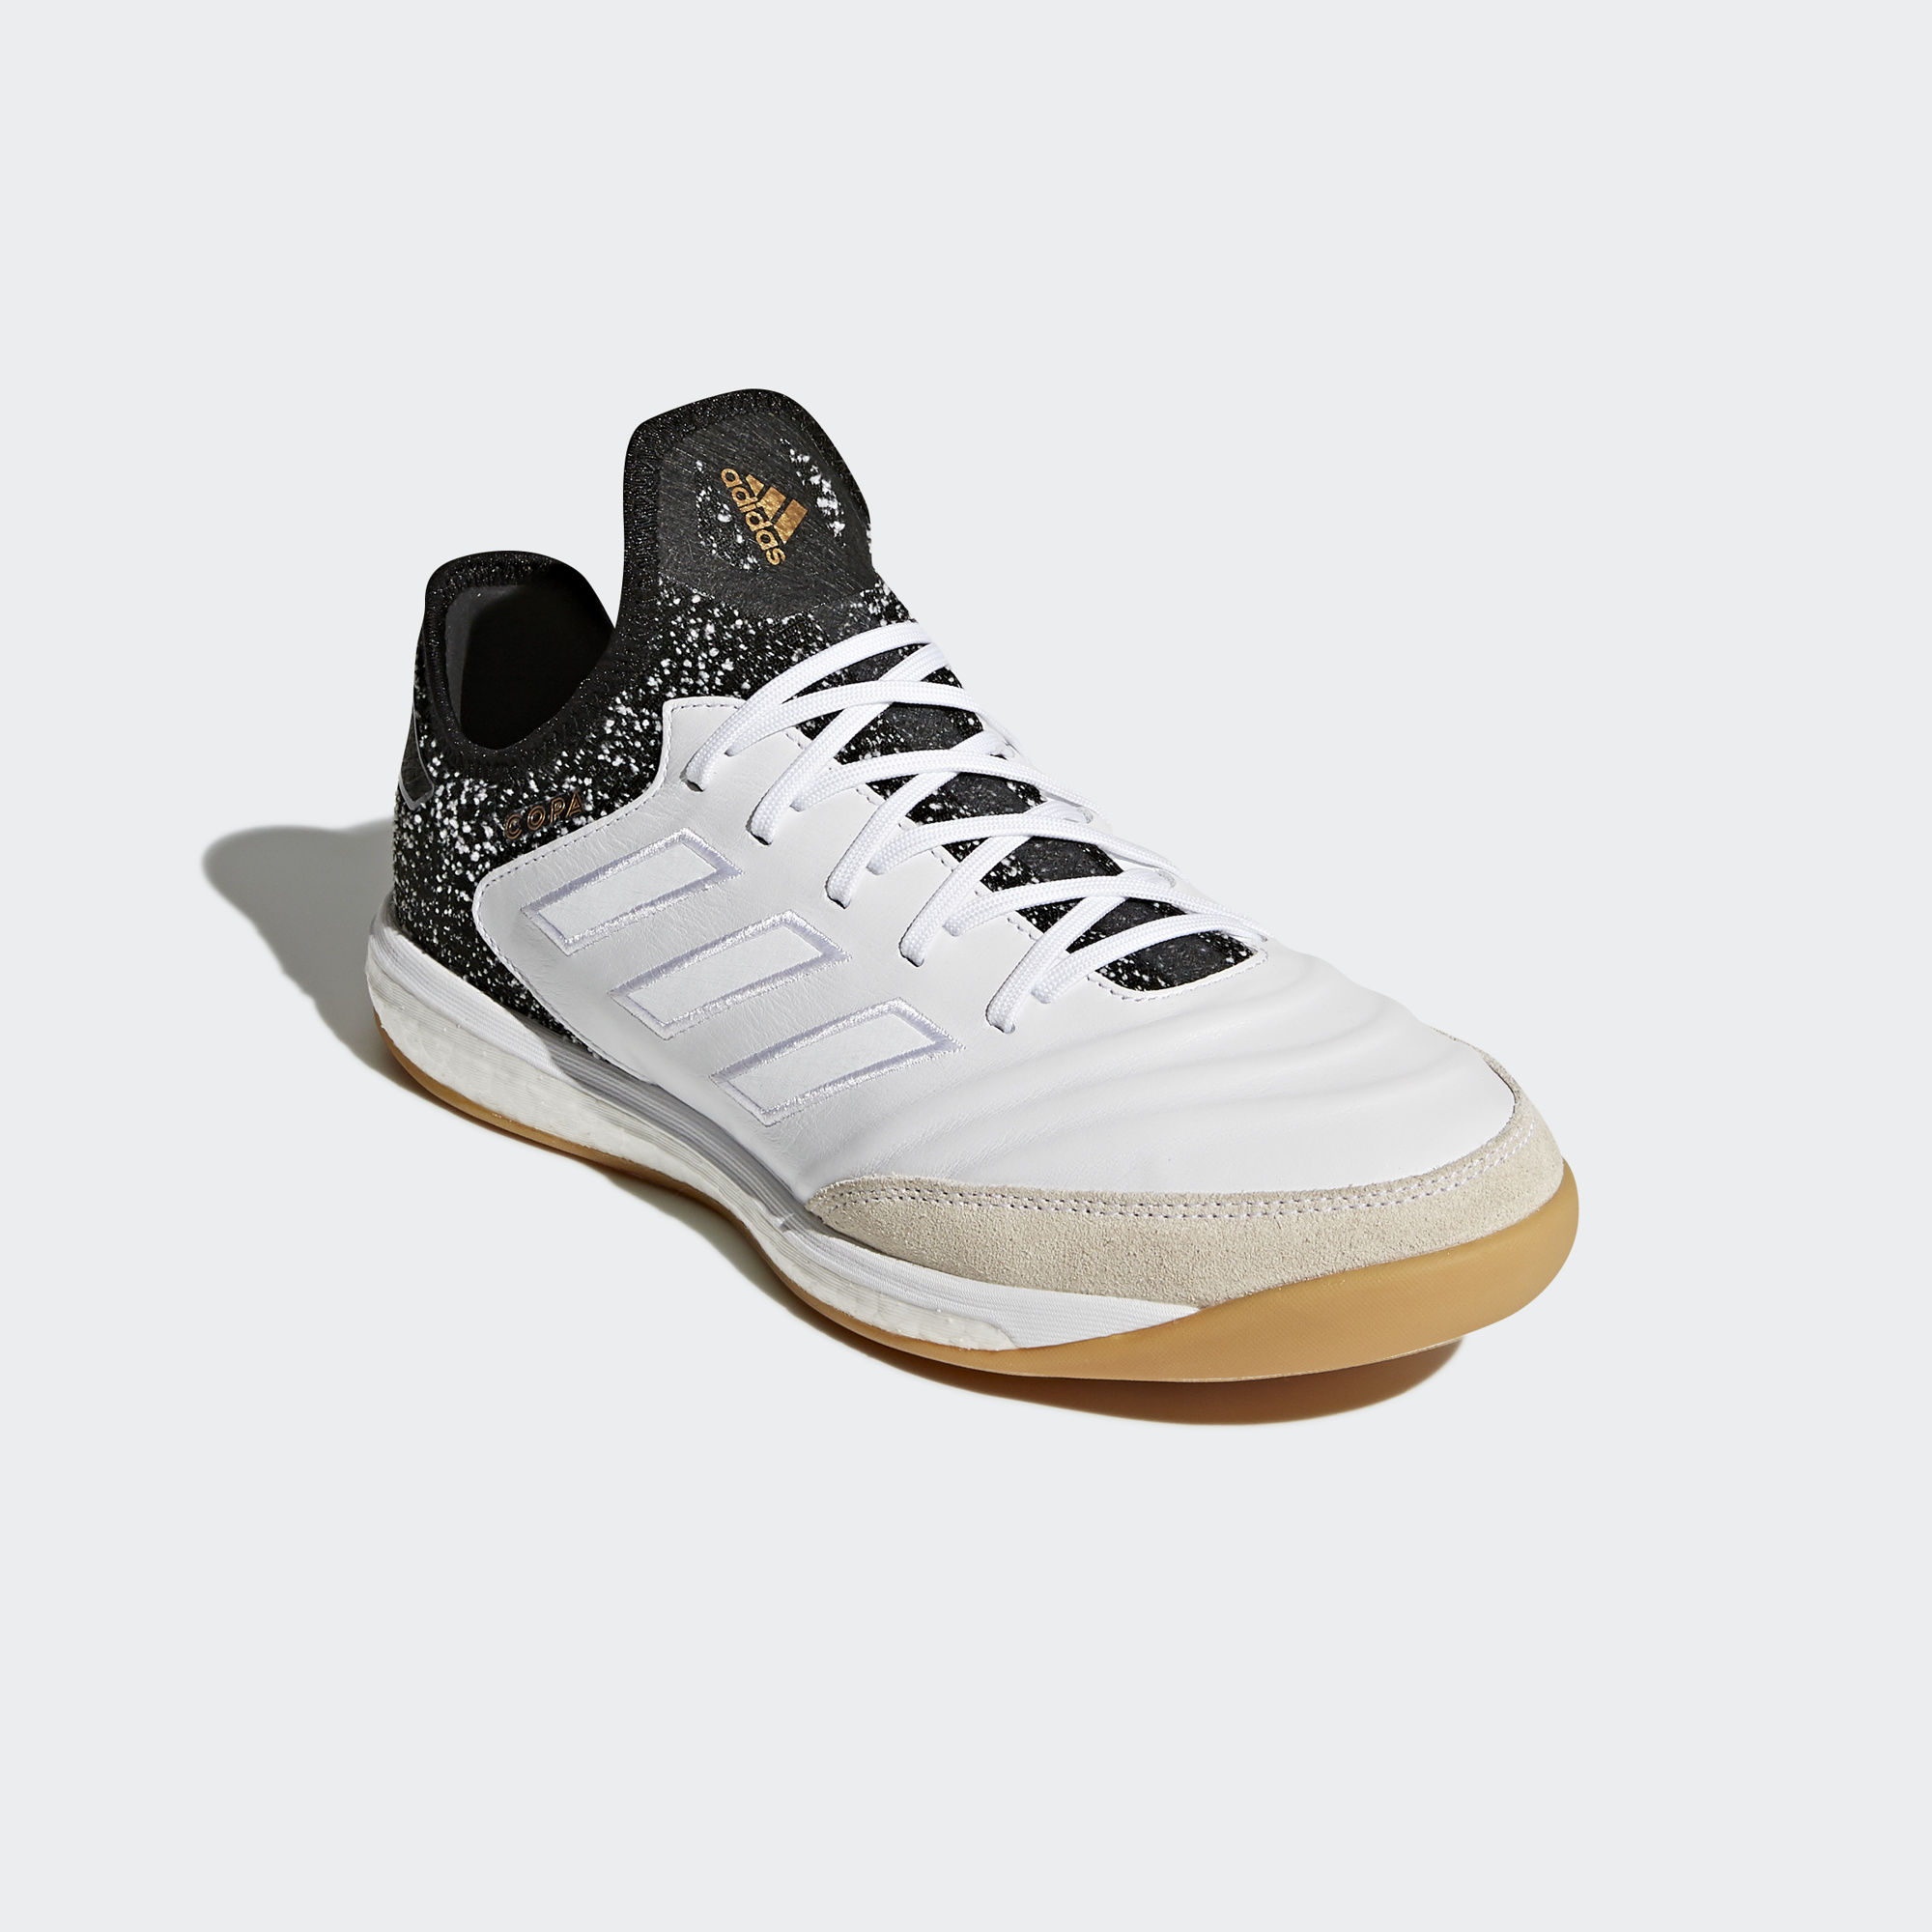 67796045b12 ... promo code 9fc4b 3603b Adidas Copa Tango 18.1 Skystalker Trainers -  Core Black Core Black Tactile ...